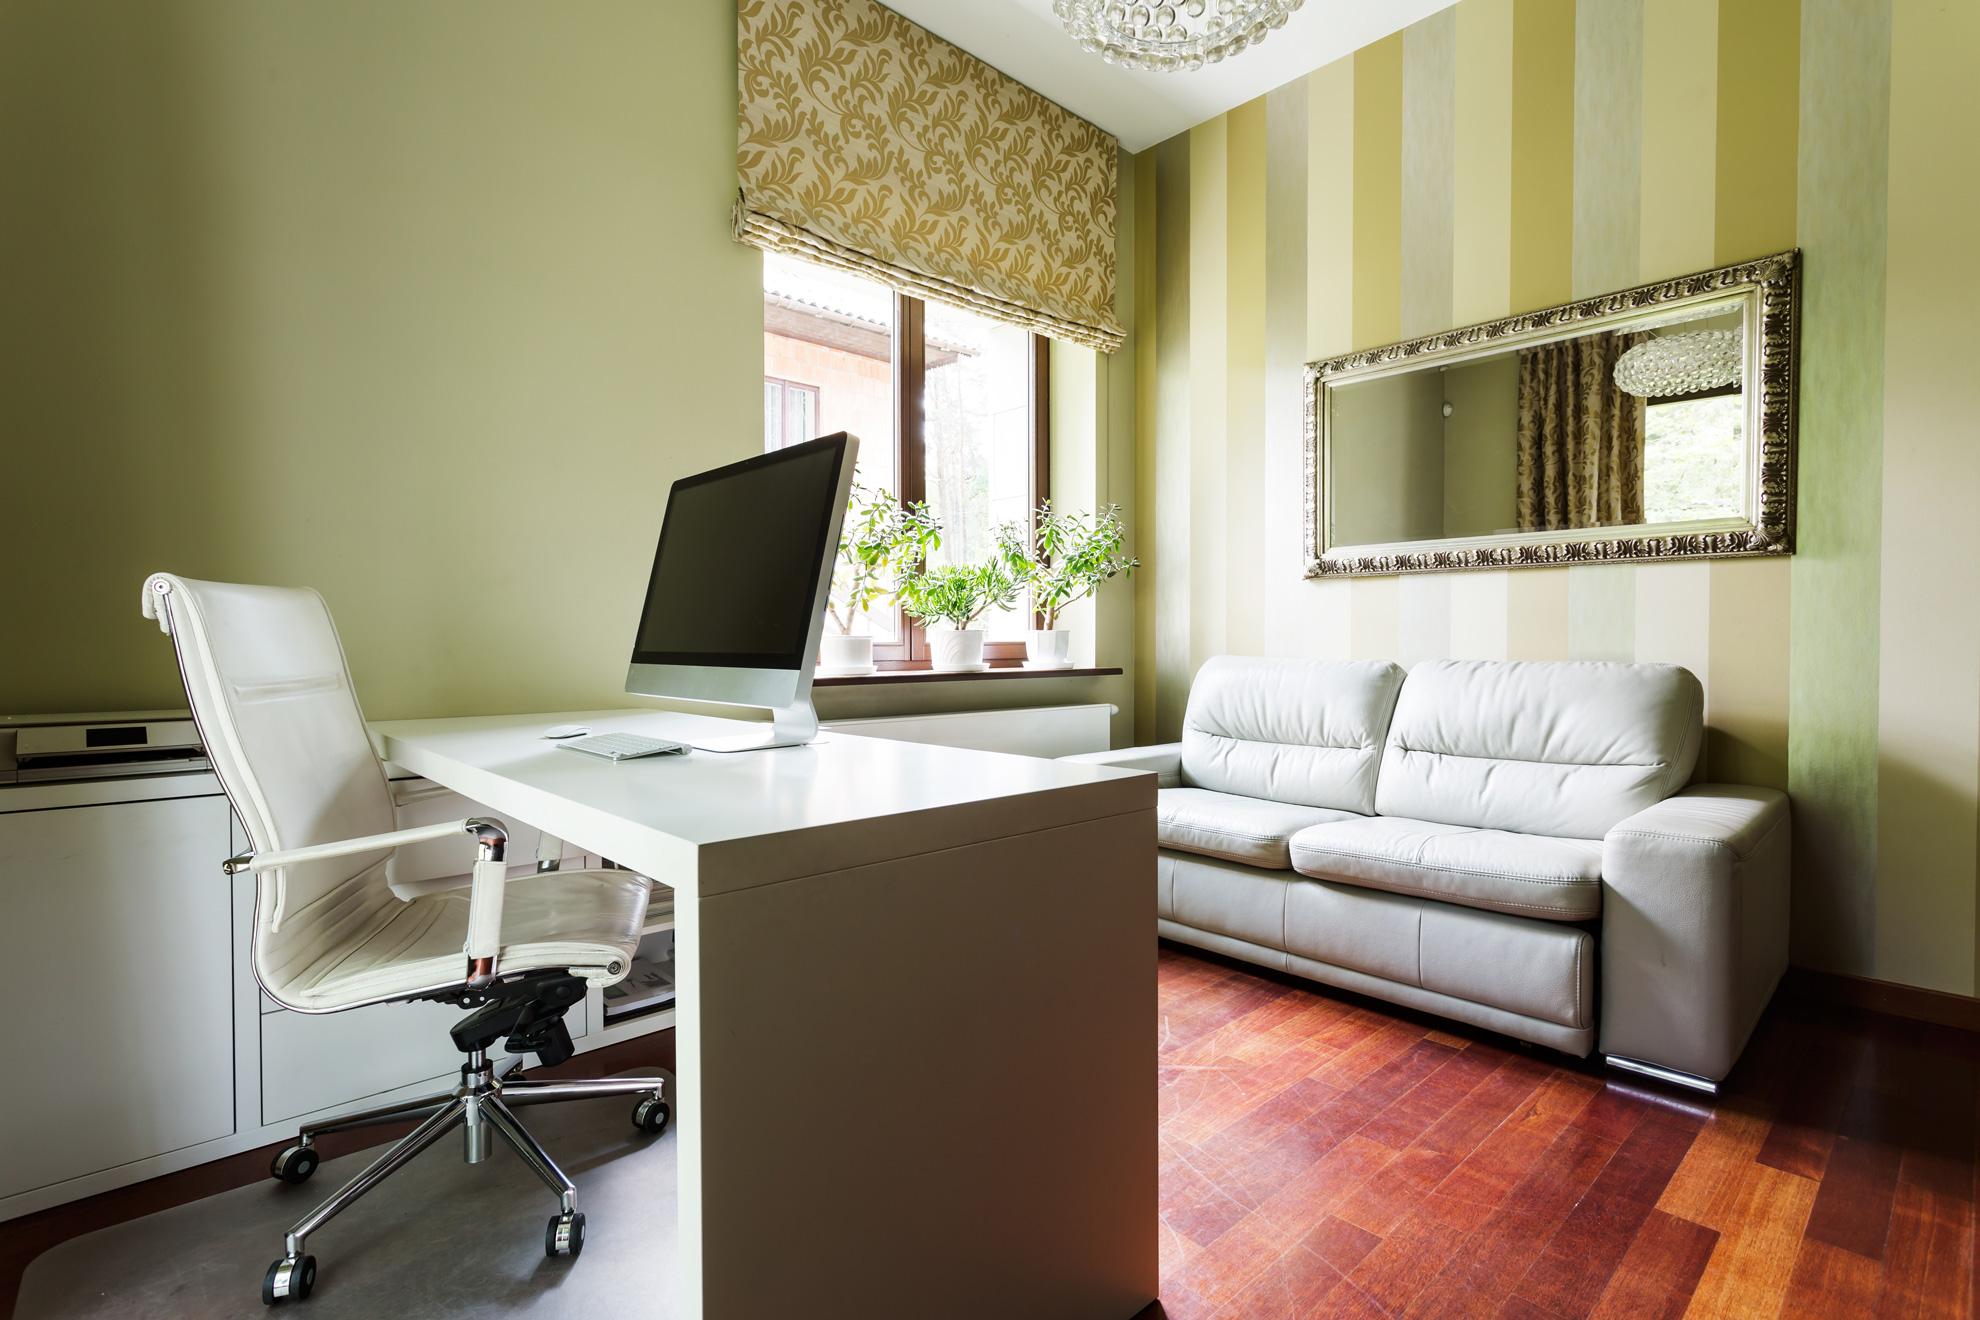 calm-office-in-pastel-colors-PJM8S88-sm.jpg